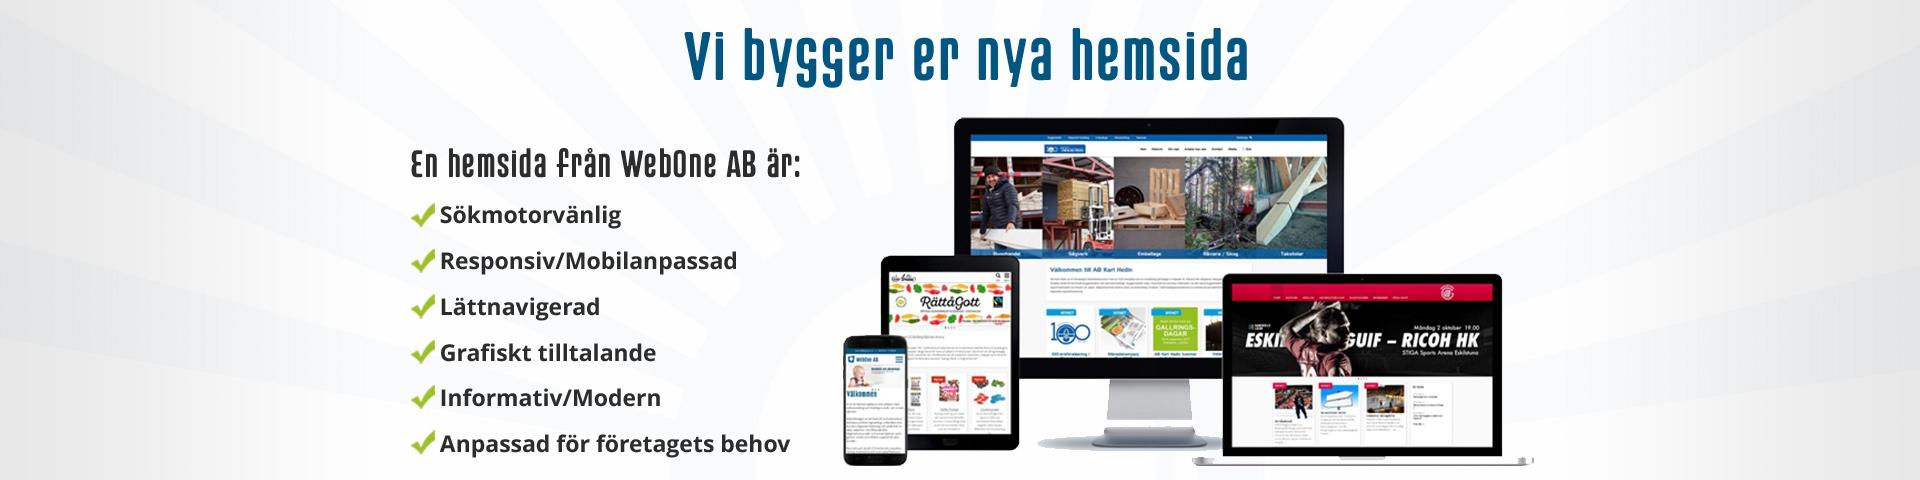 Behöver ni en hemsida?